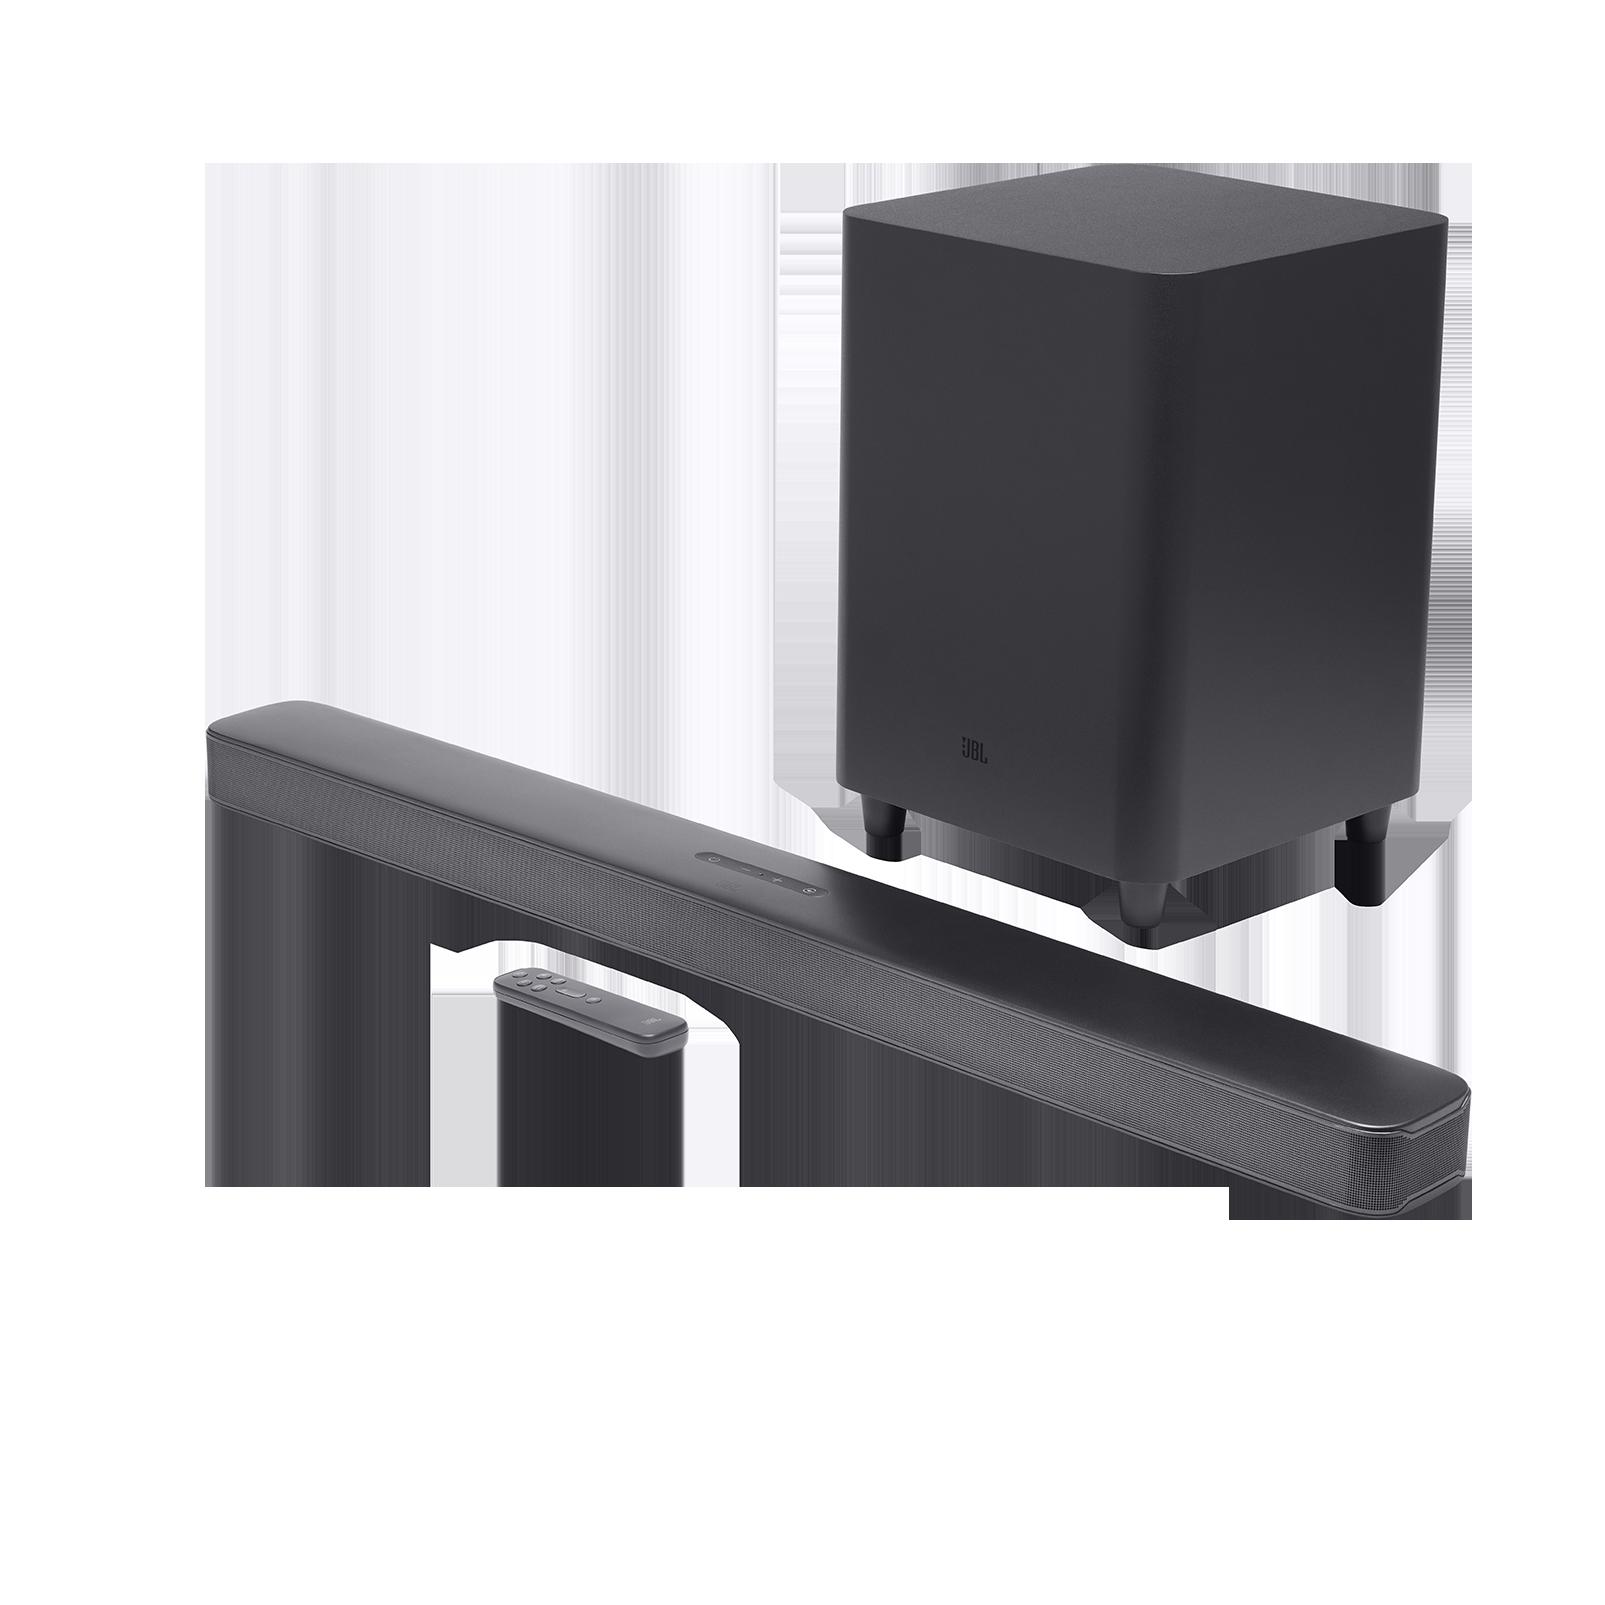 JBL Bar 5.1 Surround - Black - 5.1 channel soundbar with MultiBeam™ Sound Technology - Hero